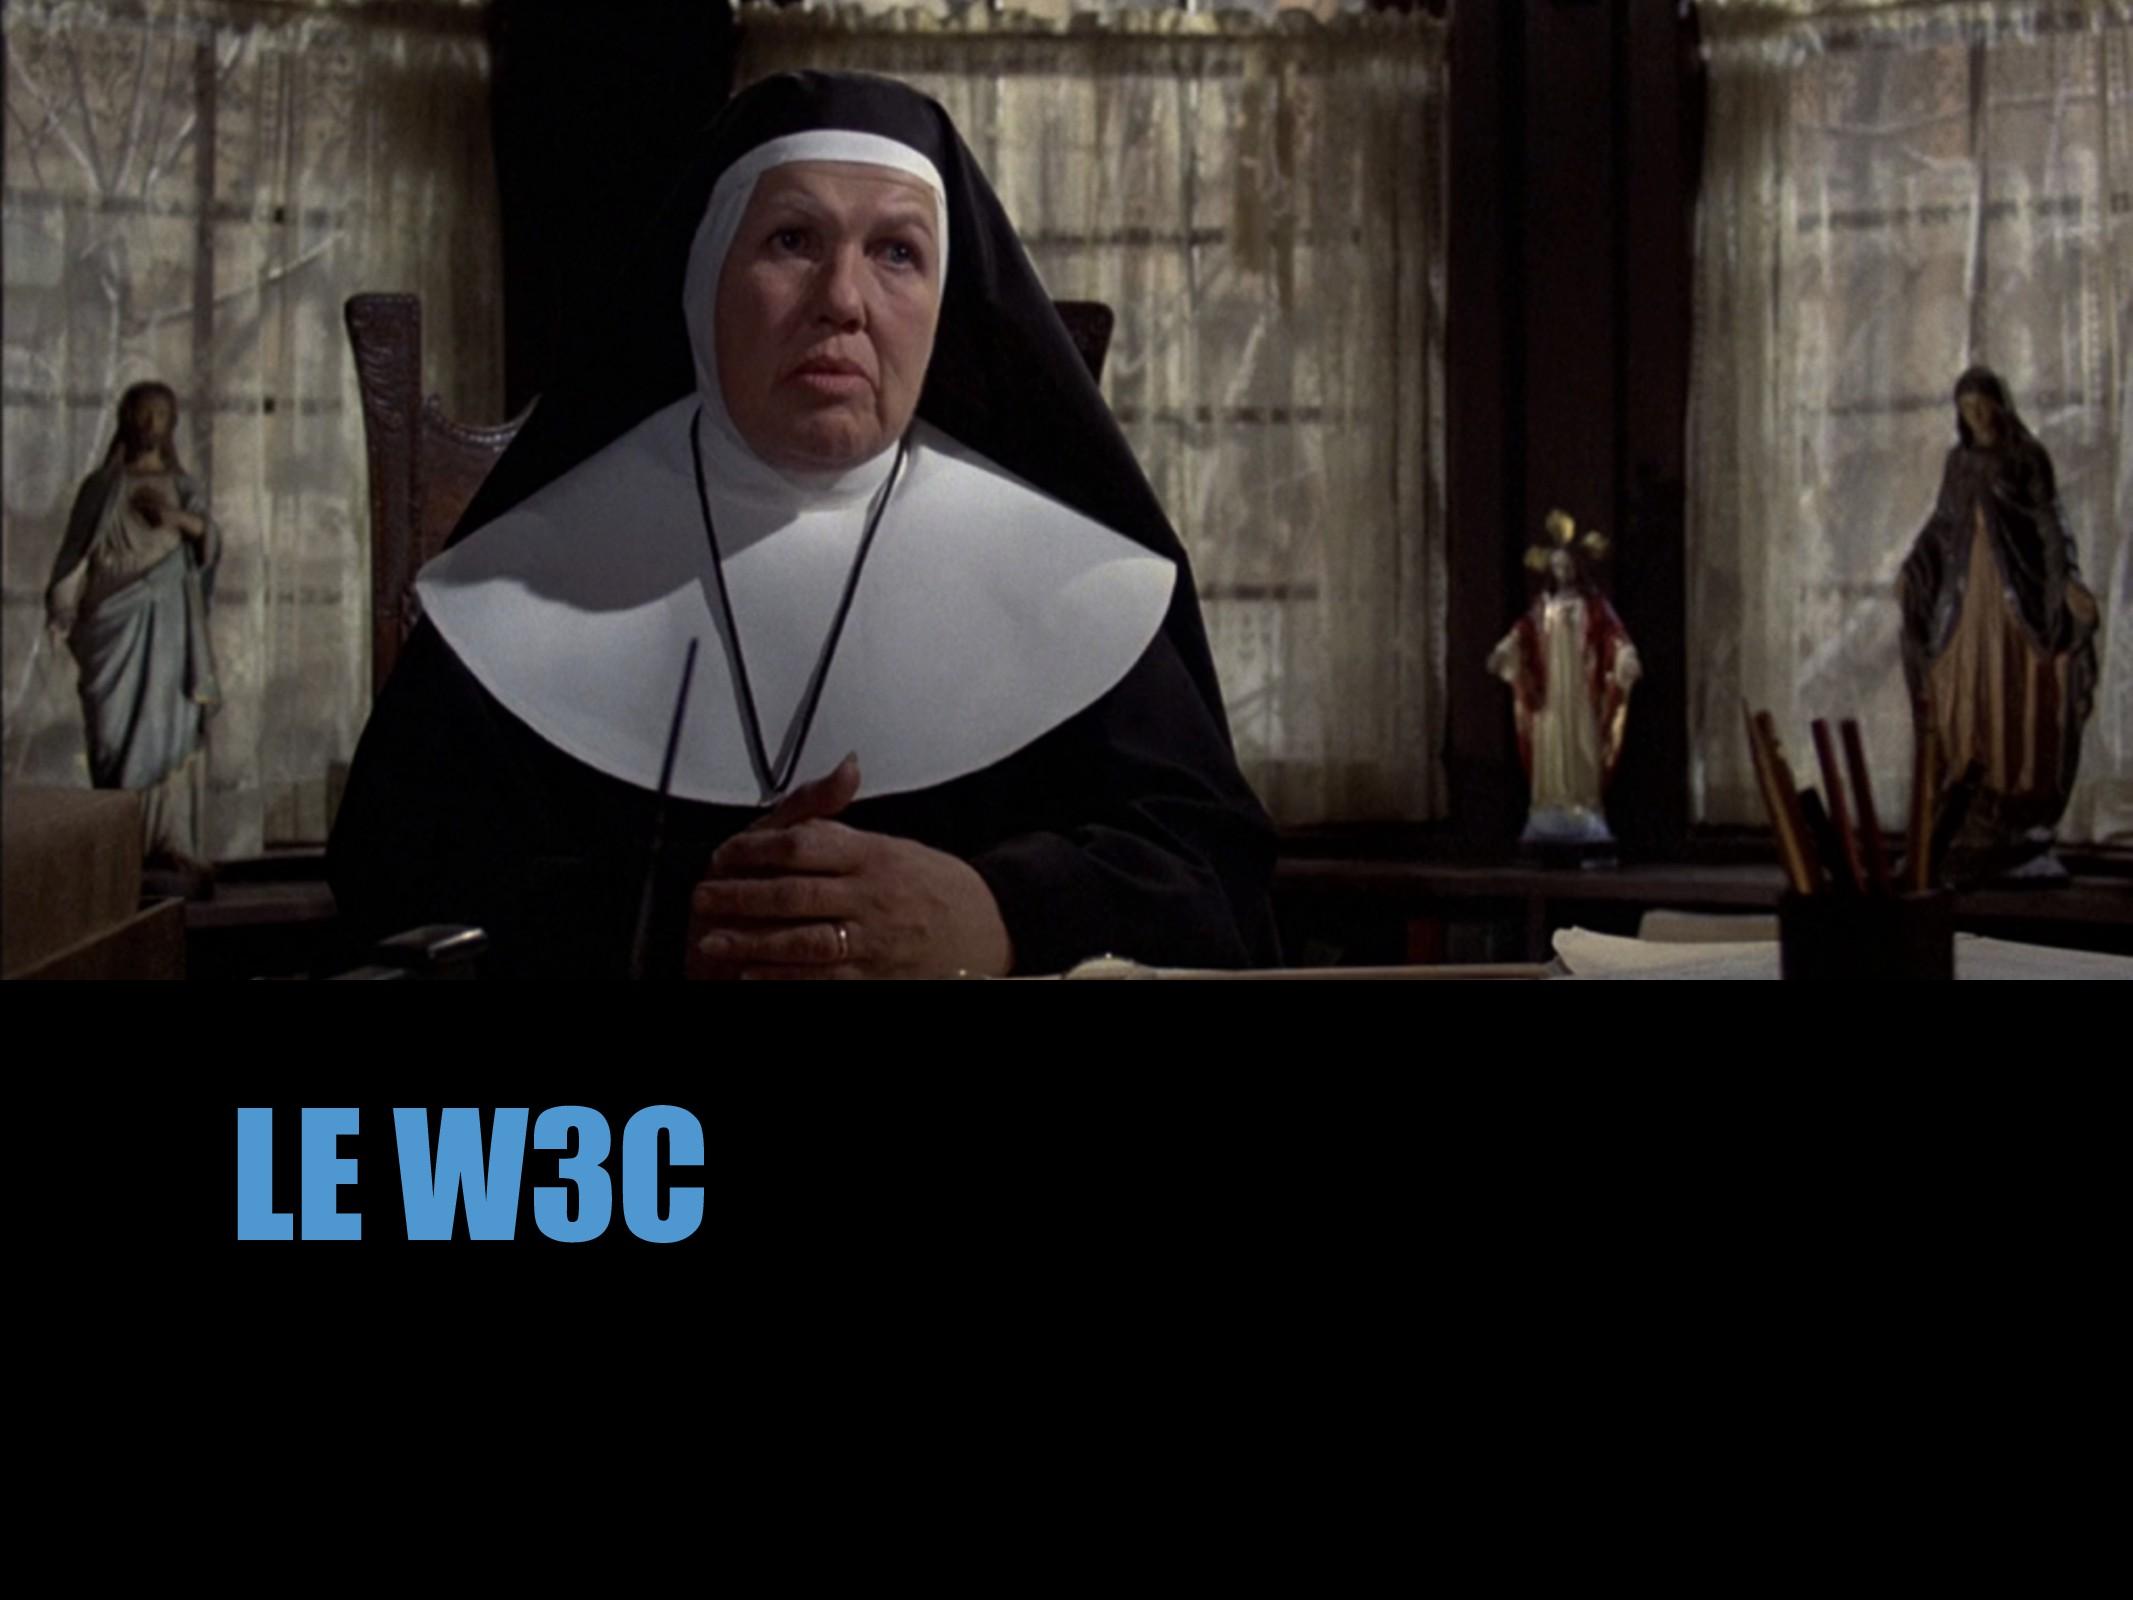 LE W3C